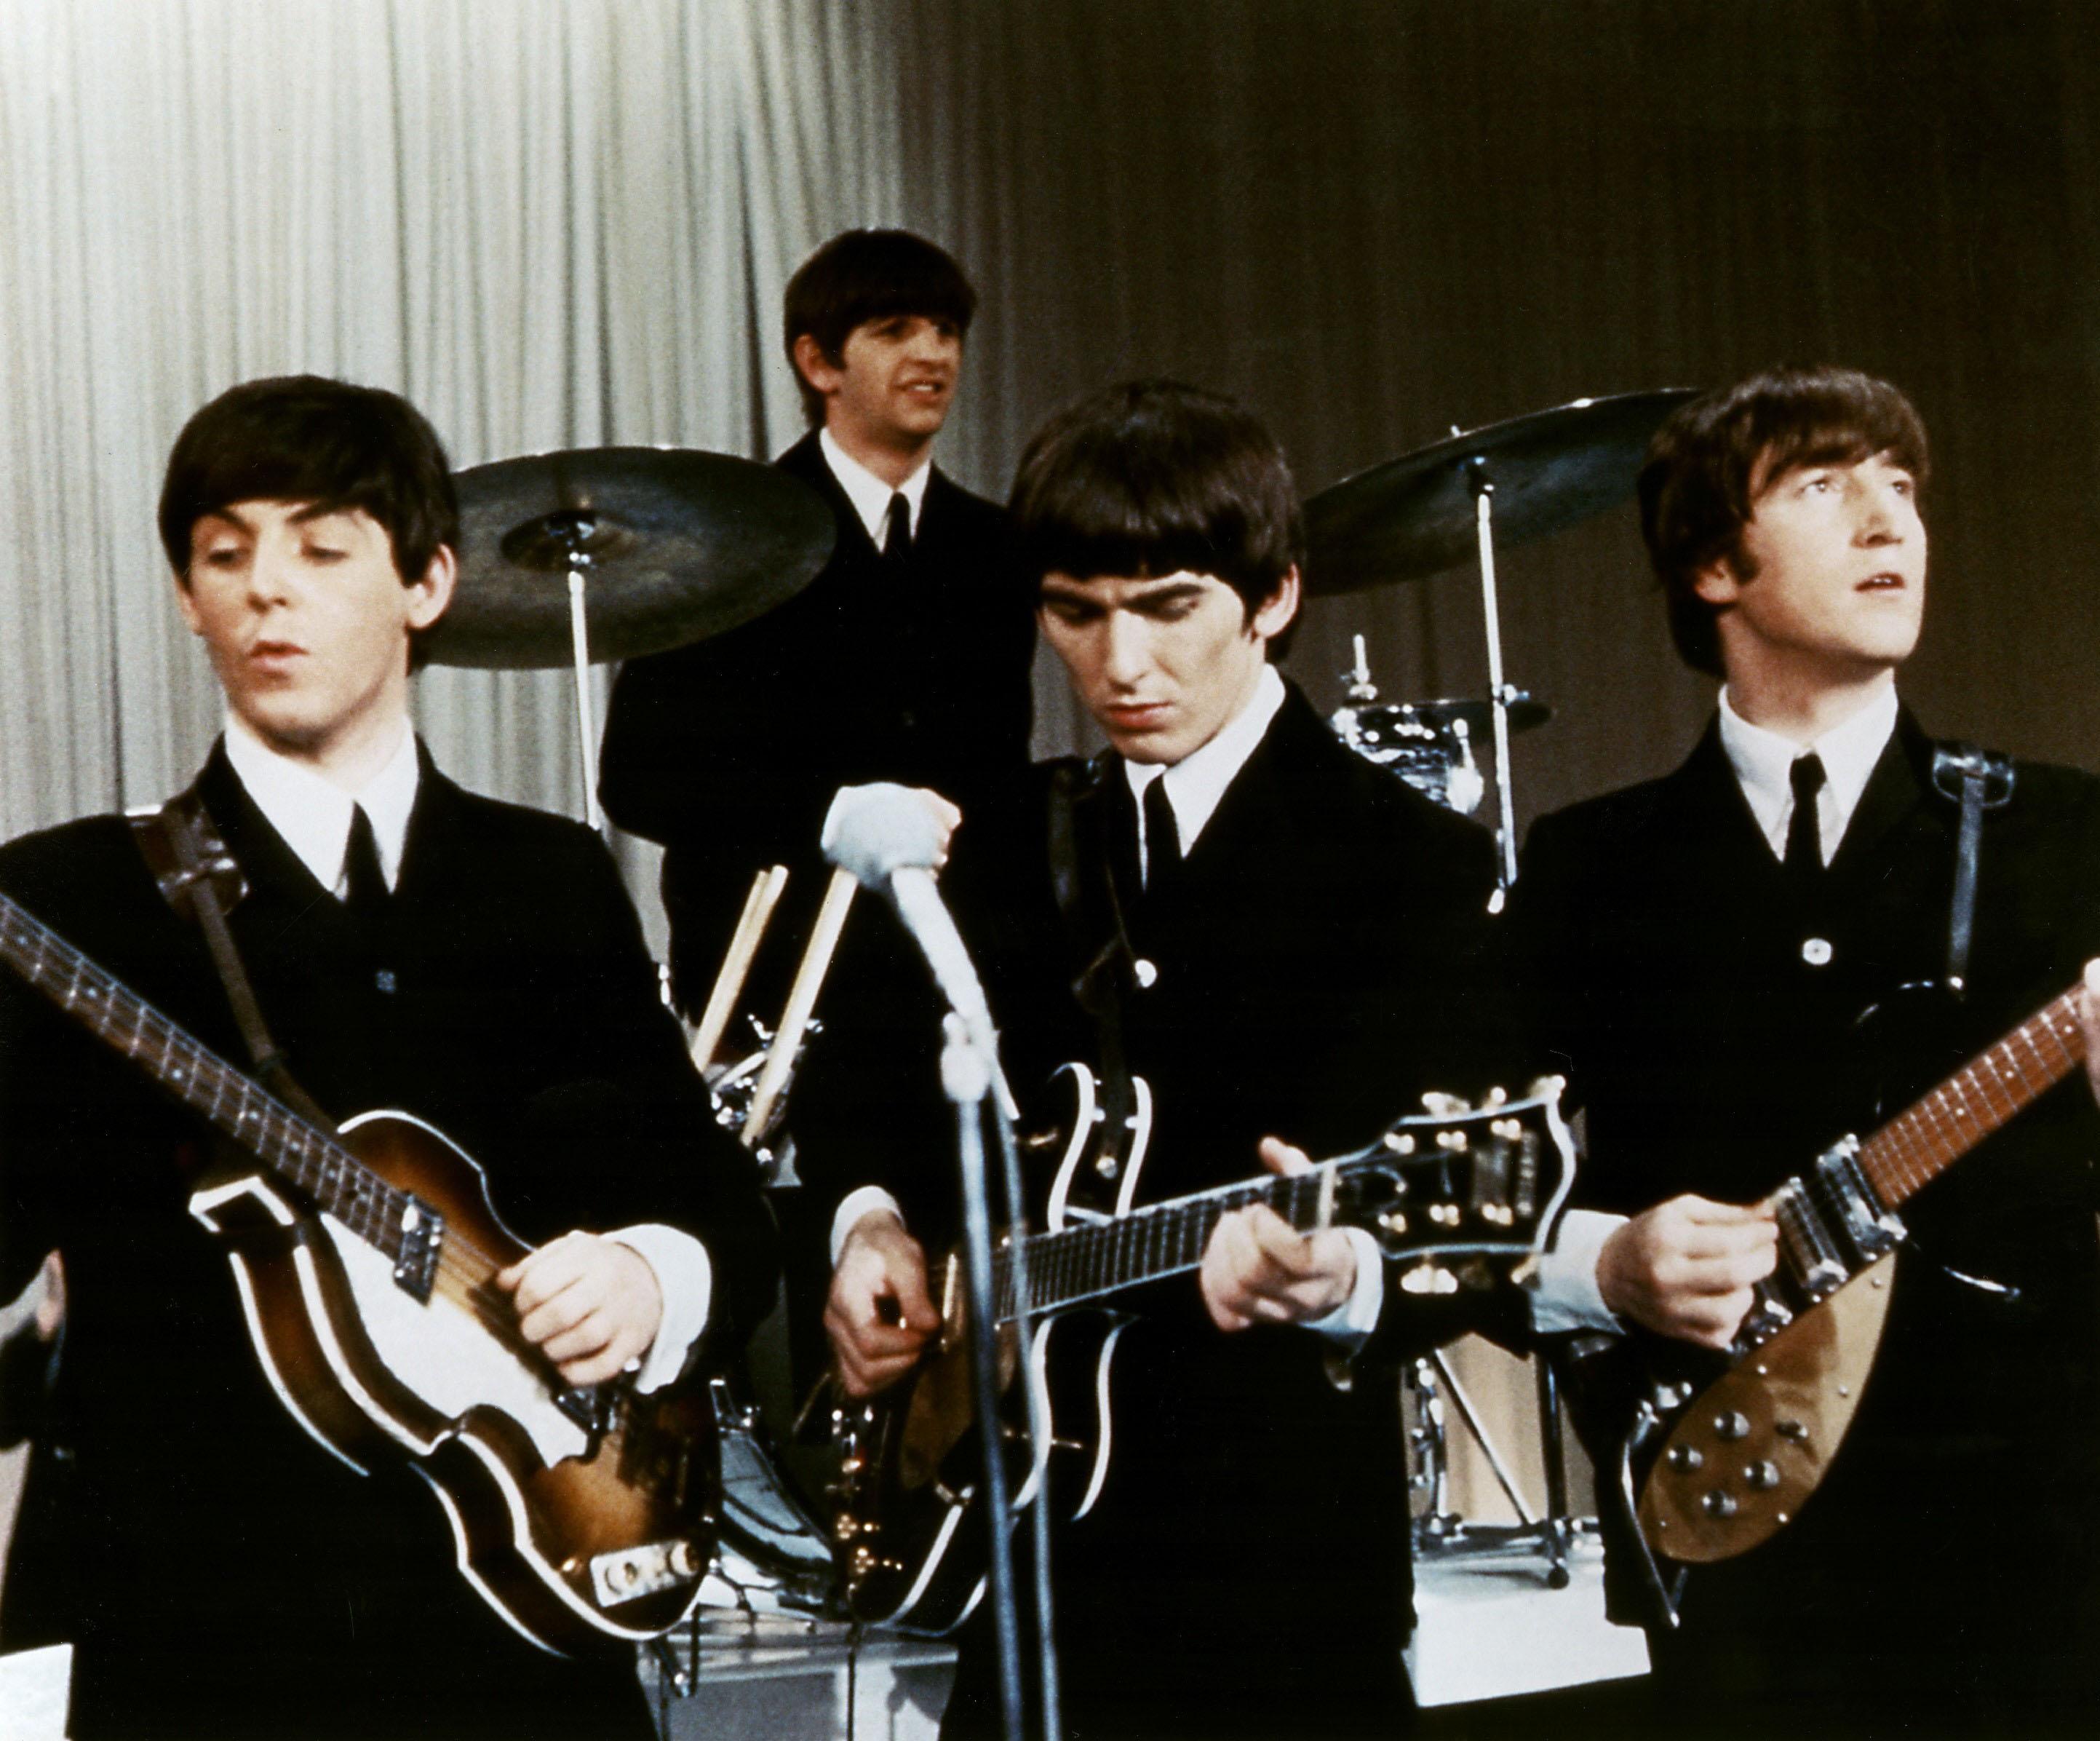 Beatles, The, 27.12.1960 - 11.4.1970, British band, with Paul McCartney, Ringo Starr, George Harrison, John Lennon, live perform